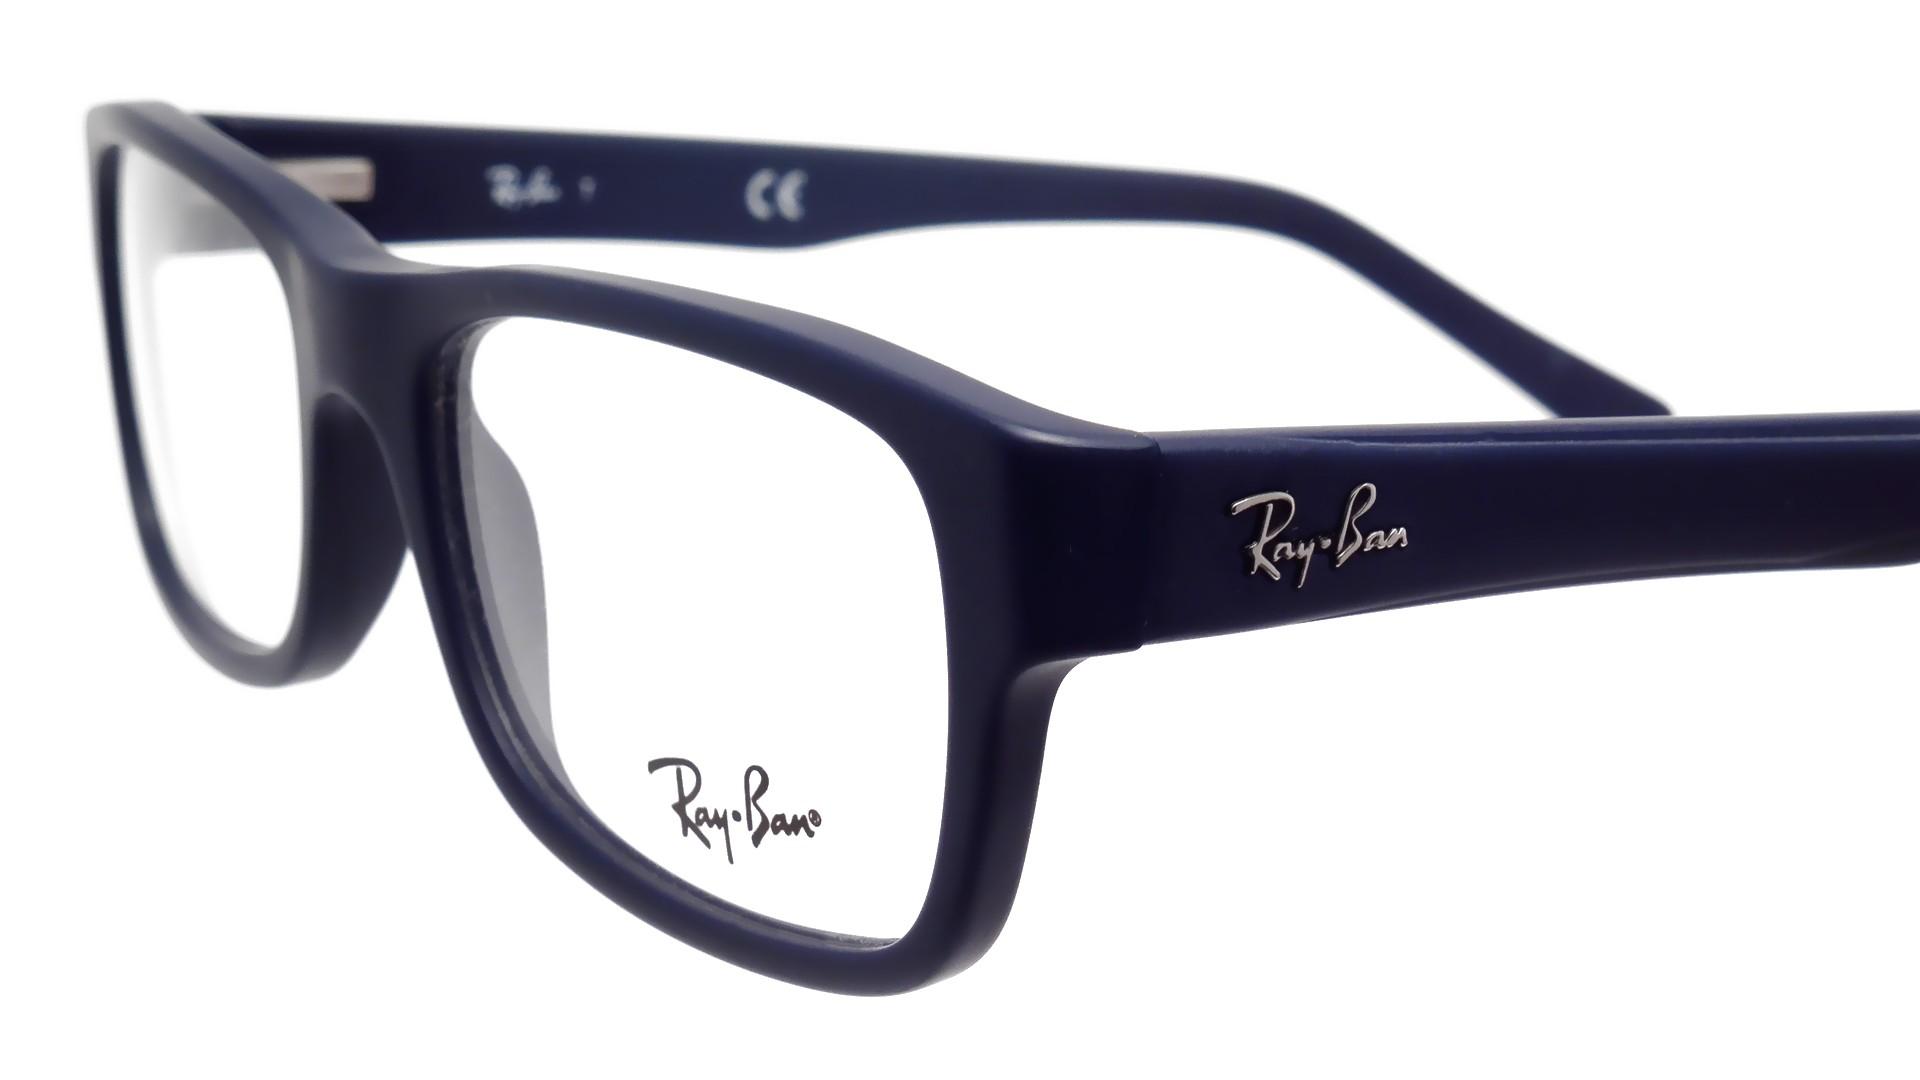 00e2e3c3f1 Ray Ban Rx5268 Youngster Eyeglasses « Heritage Malta